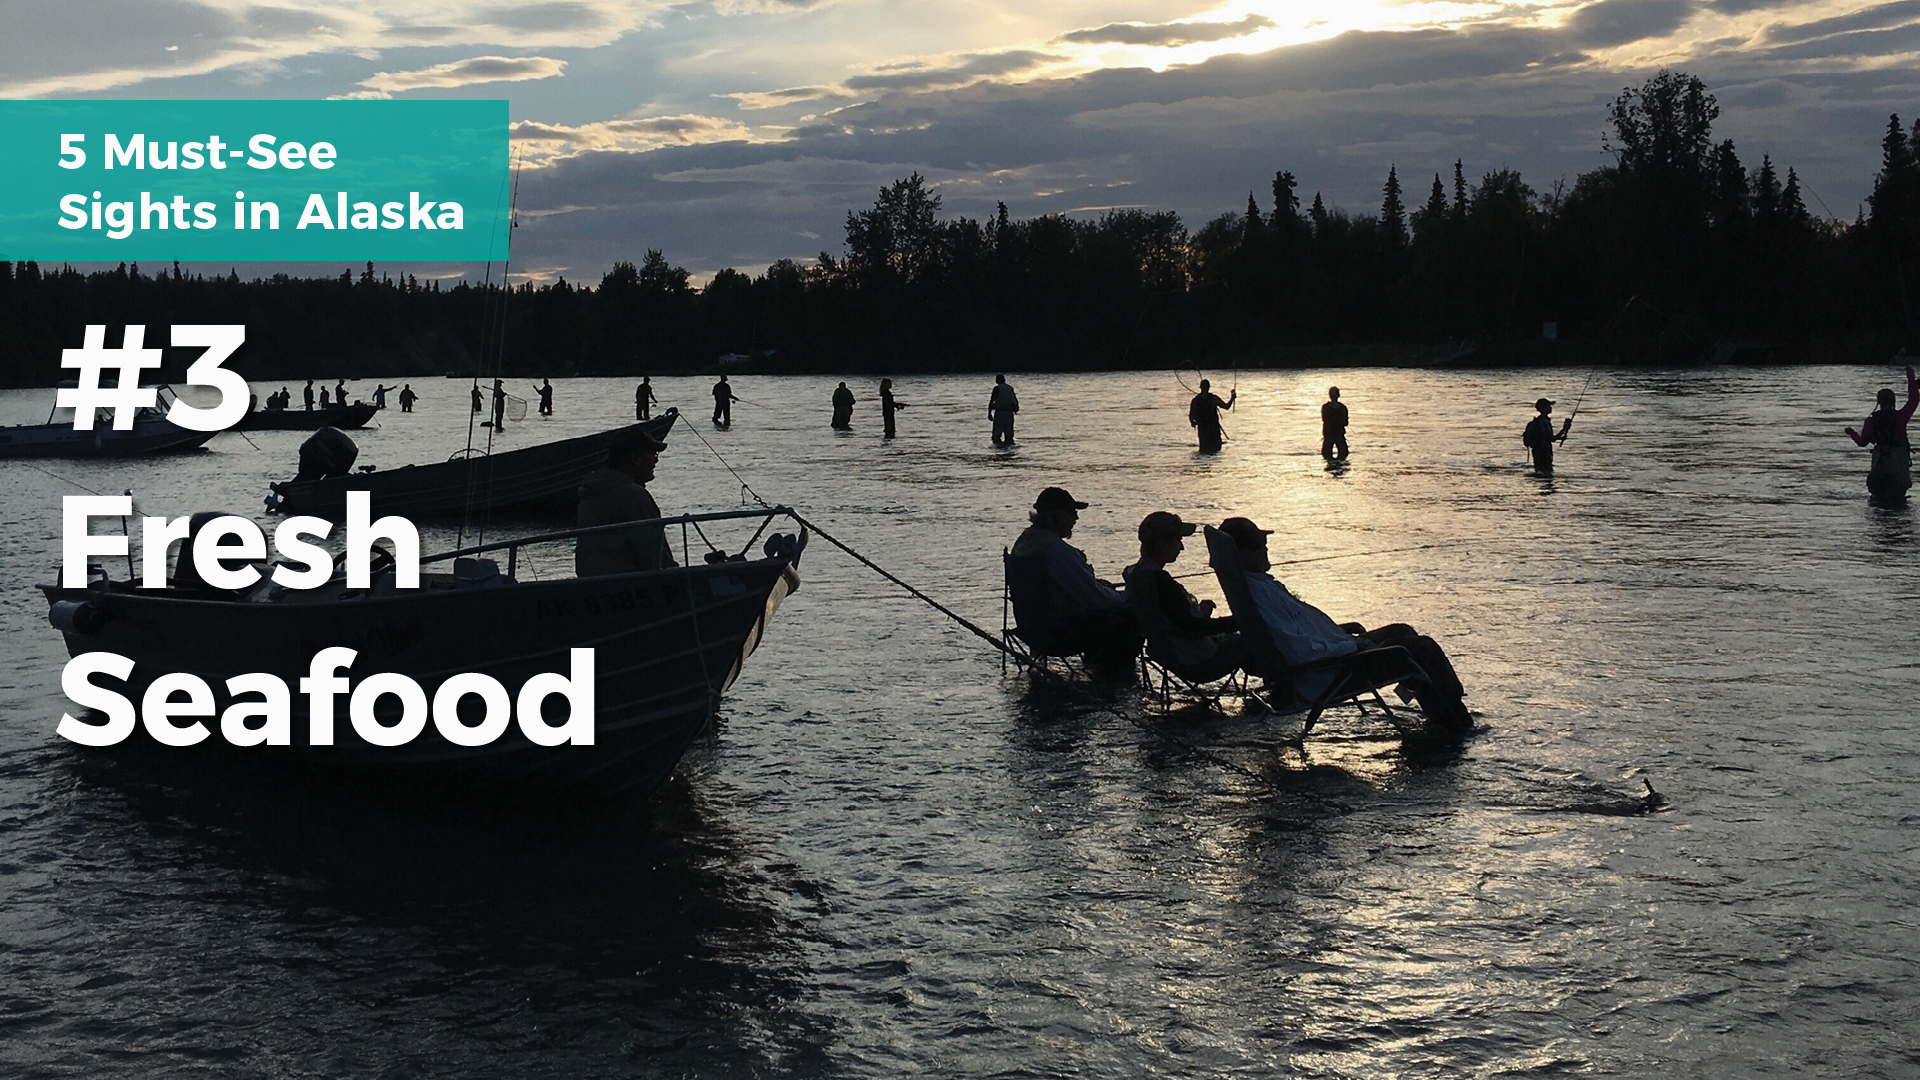 5-must-see-sights-in-alaska-fresh-seafood